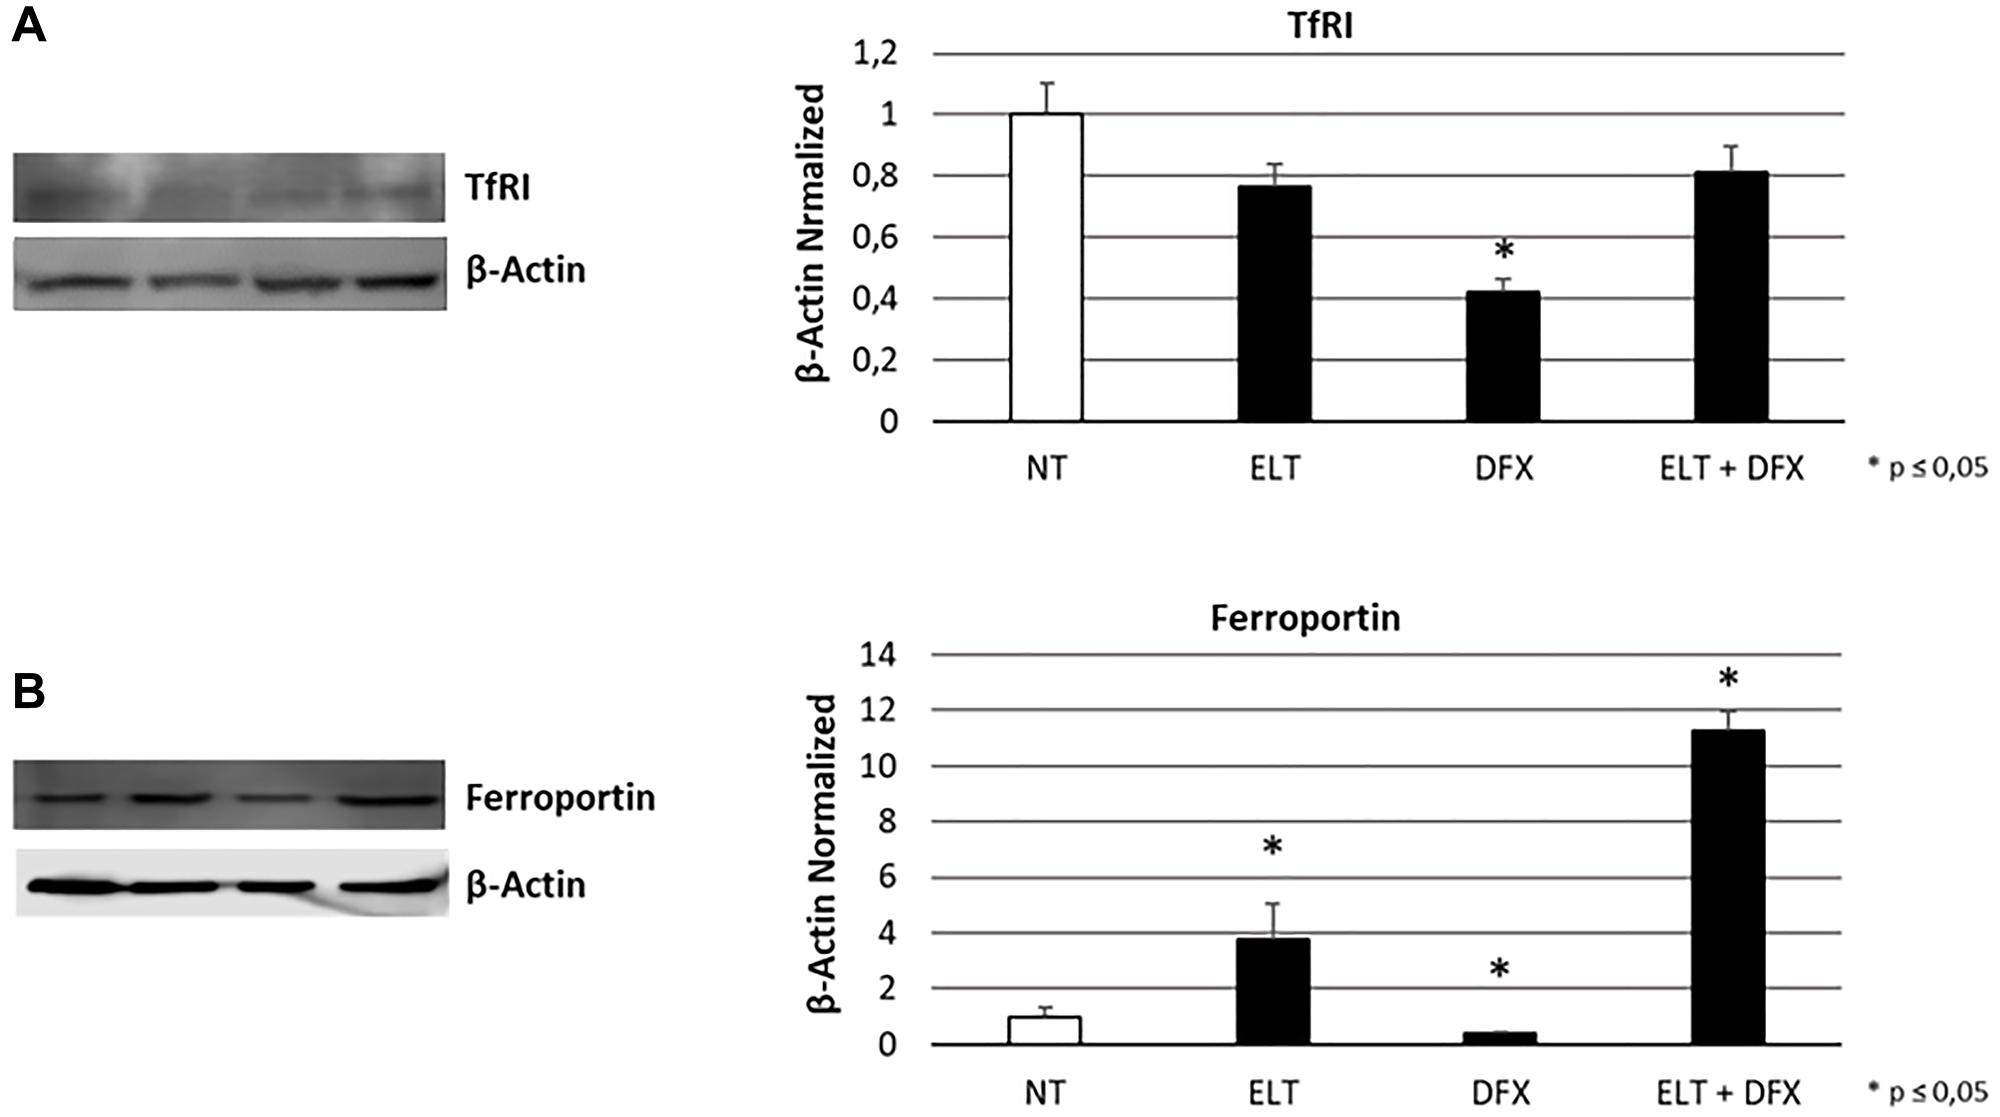 Effect of ELT and DFX on iron metabolism mediators.